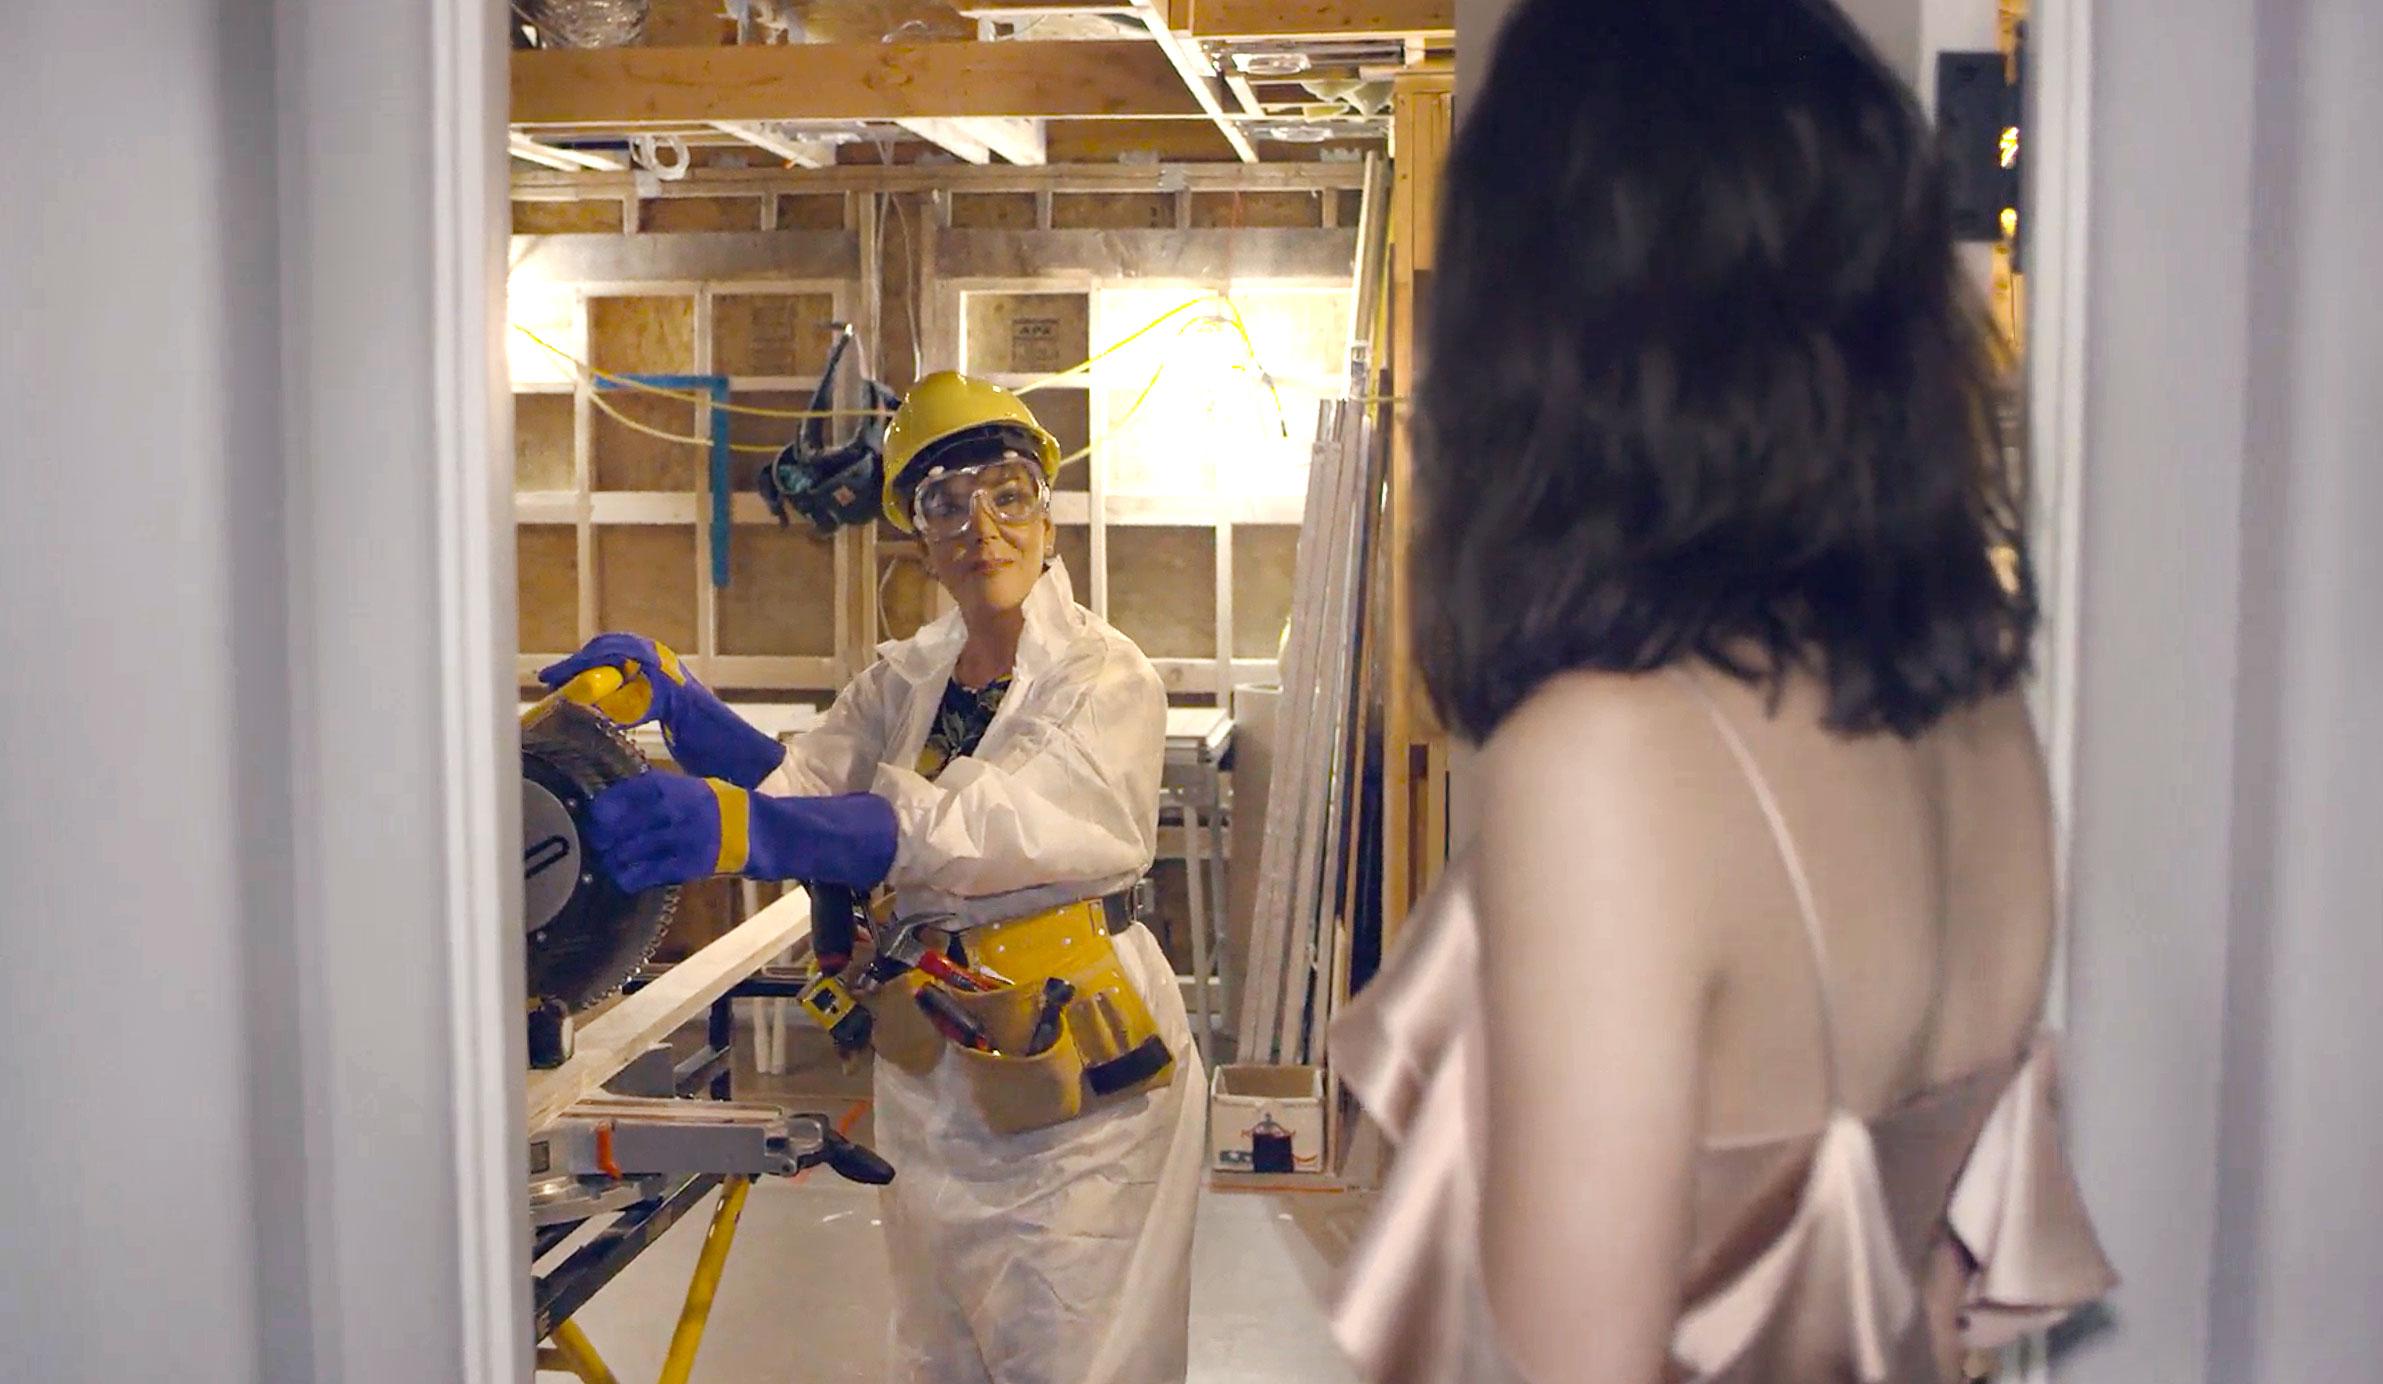 Kendall Jenner Walks In On Her Mom, Kris, Renovating Her Old Bedroom.  Courtesy Vogue